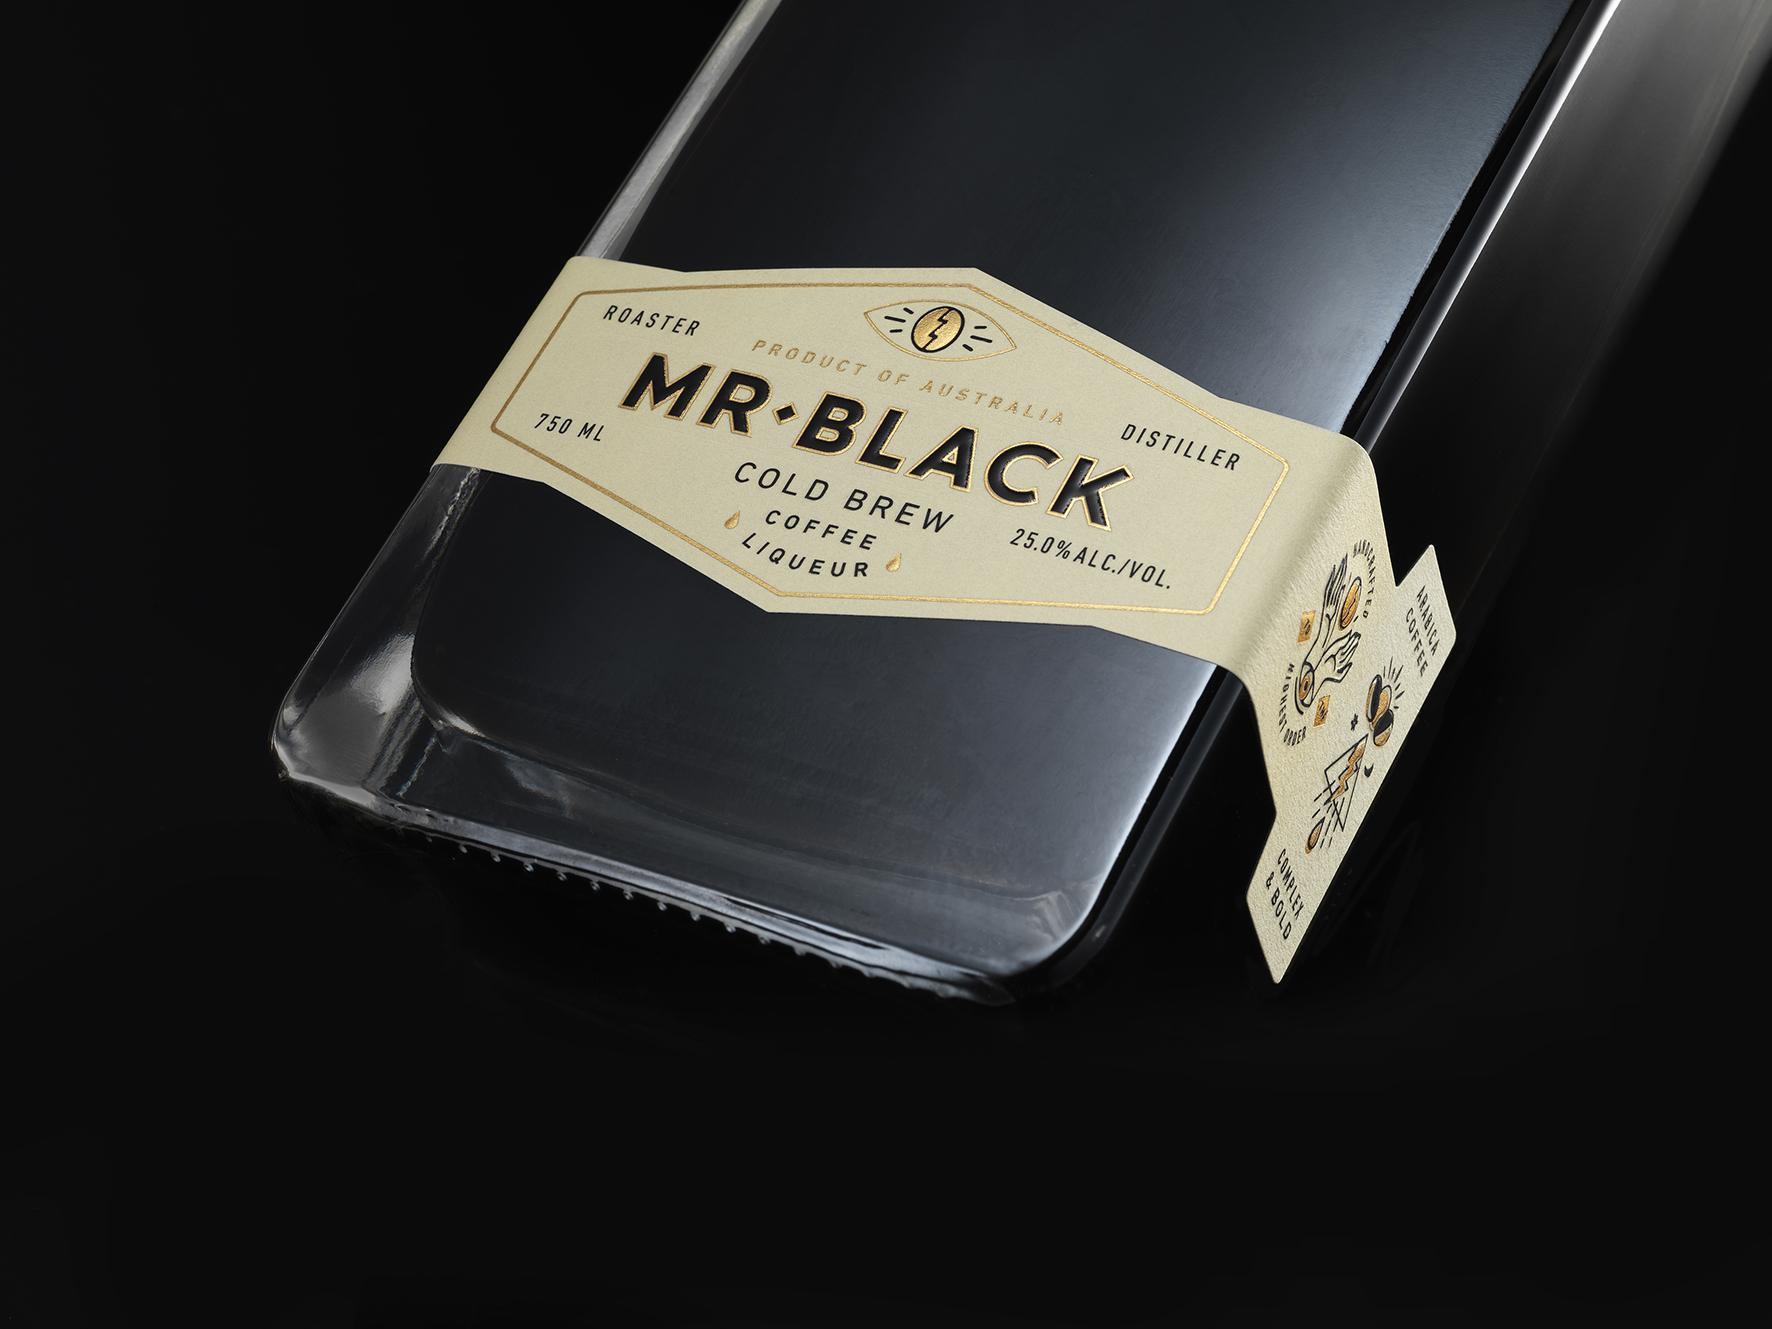 Mr Black Cold Brew Coffee Liqueur Detail 1 Low Res.jpg